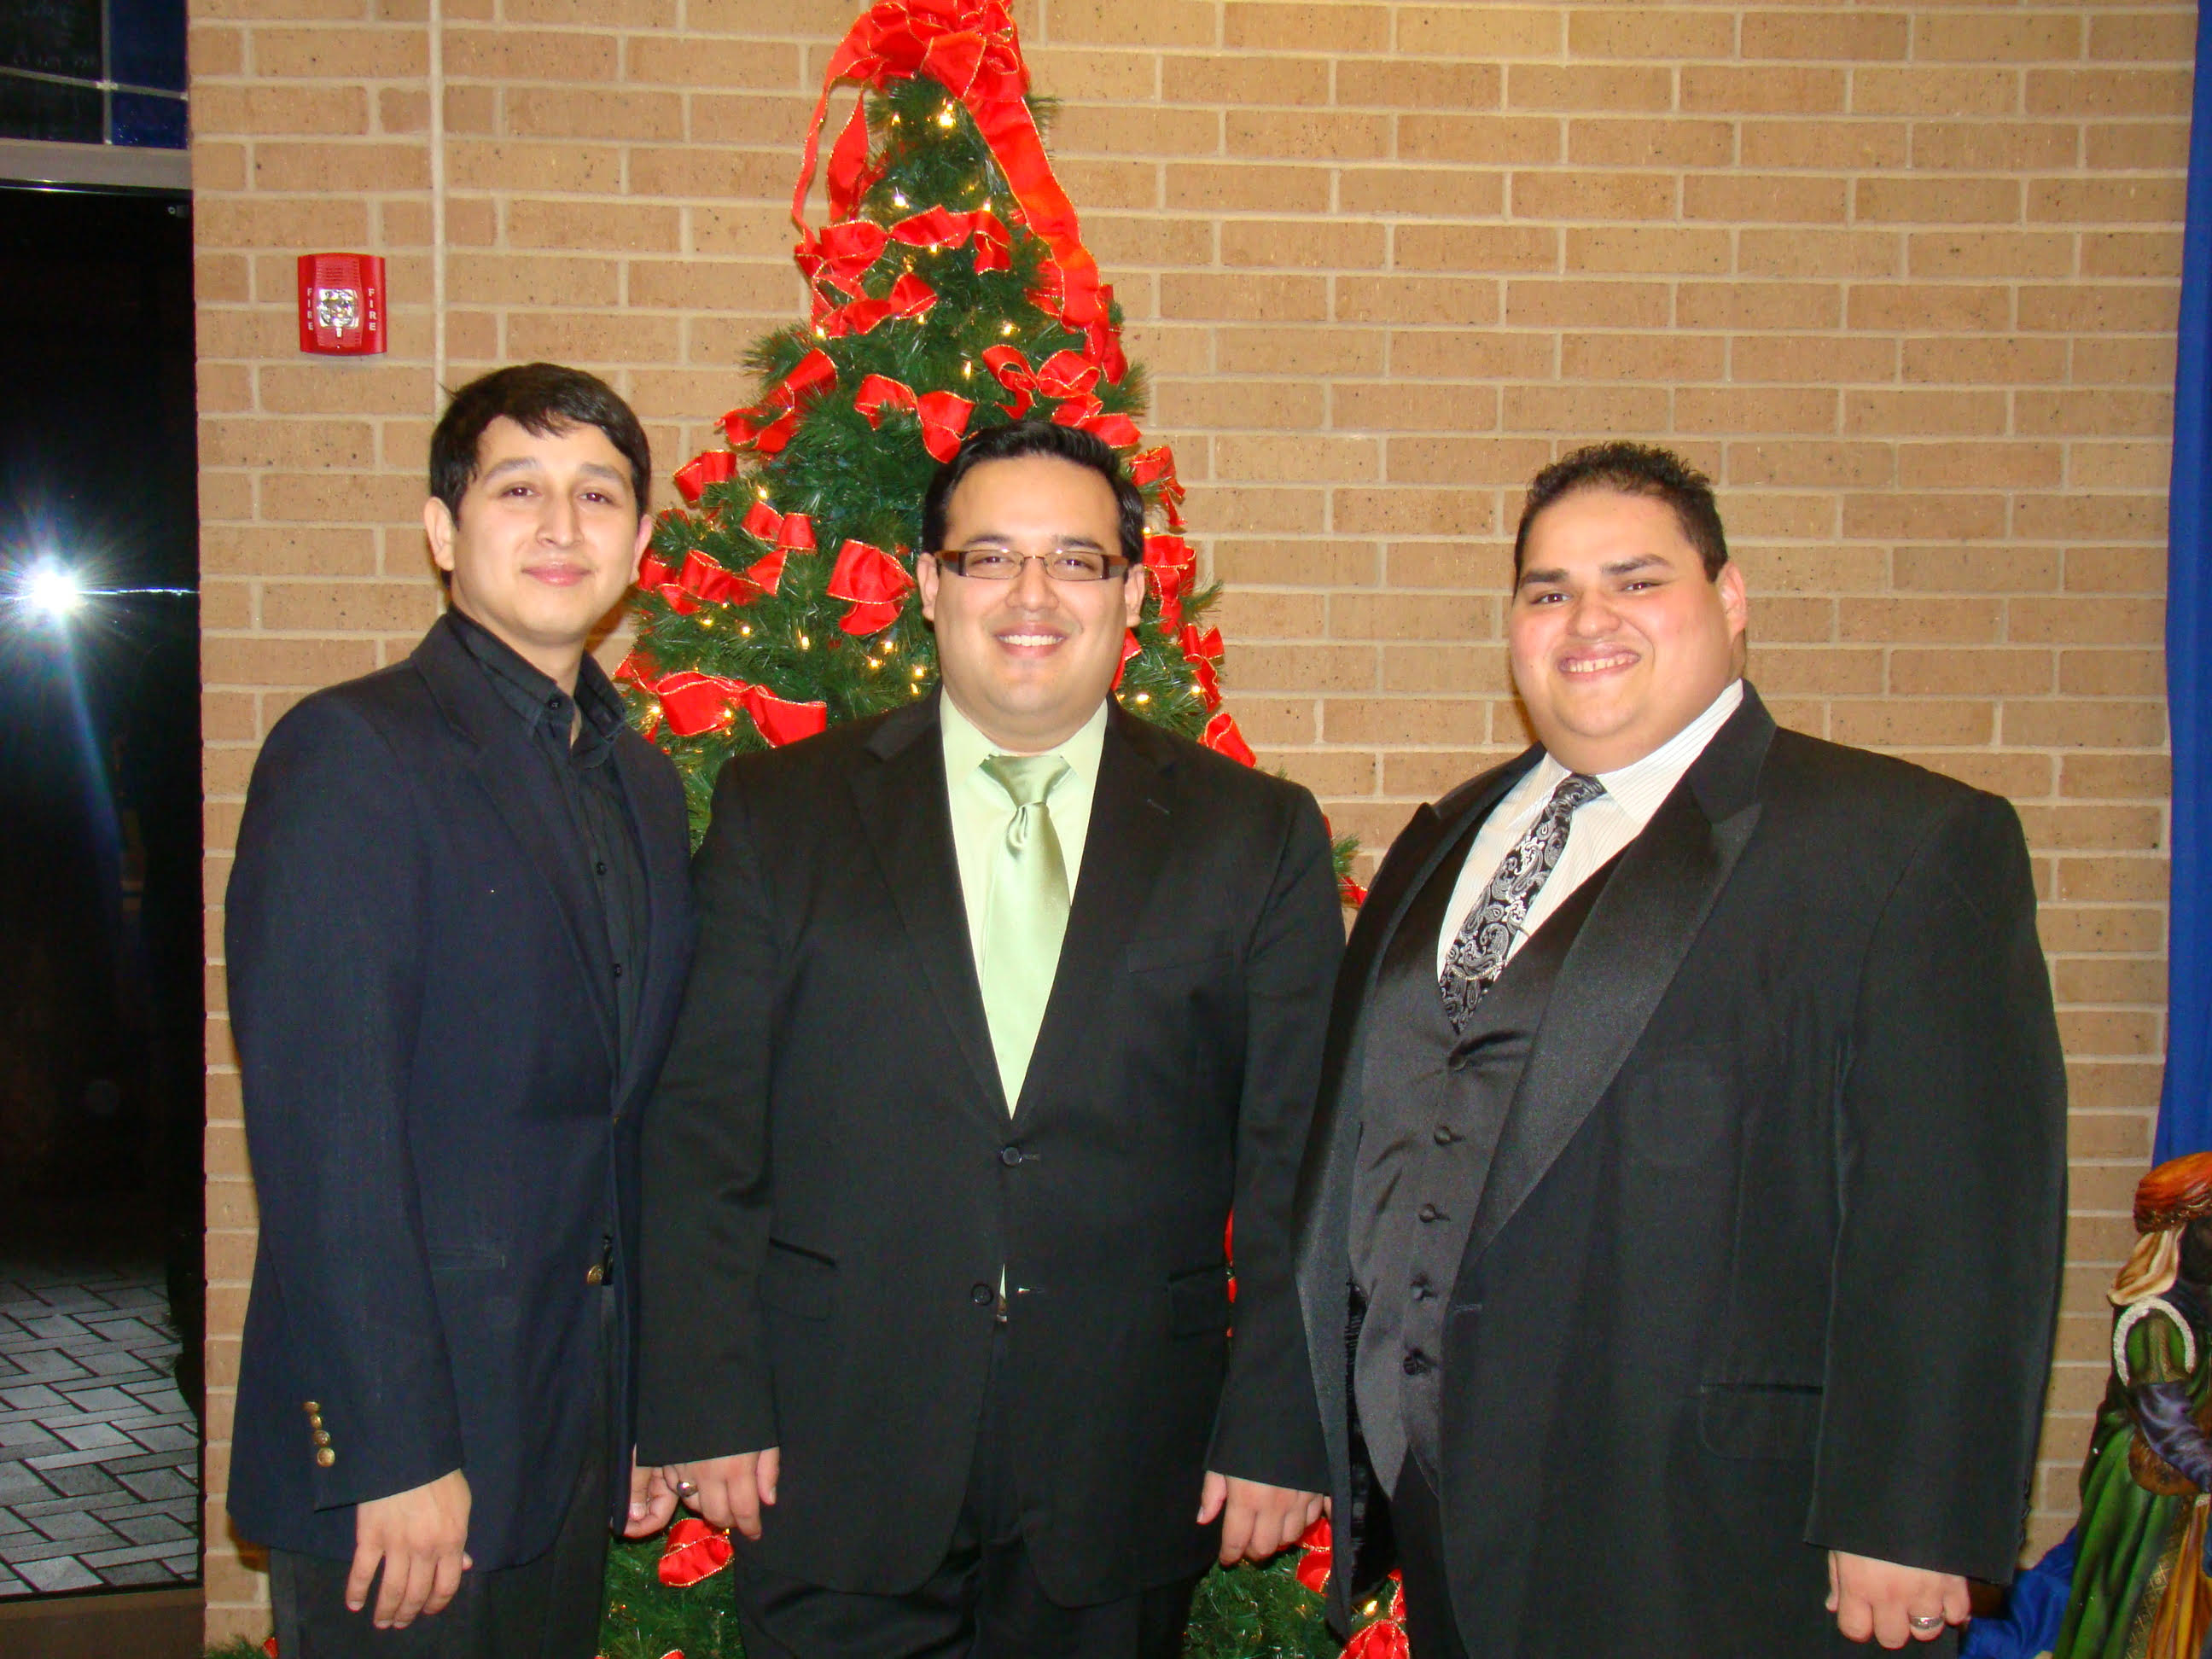 Adam A Torres, Marco Antonio Melendez, Joshua Diaz